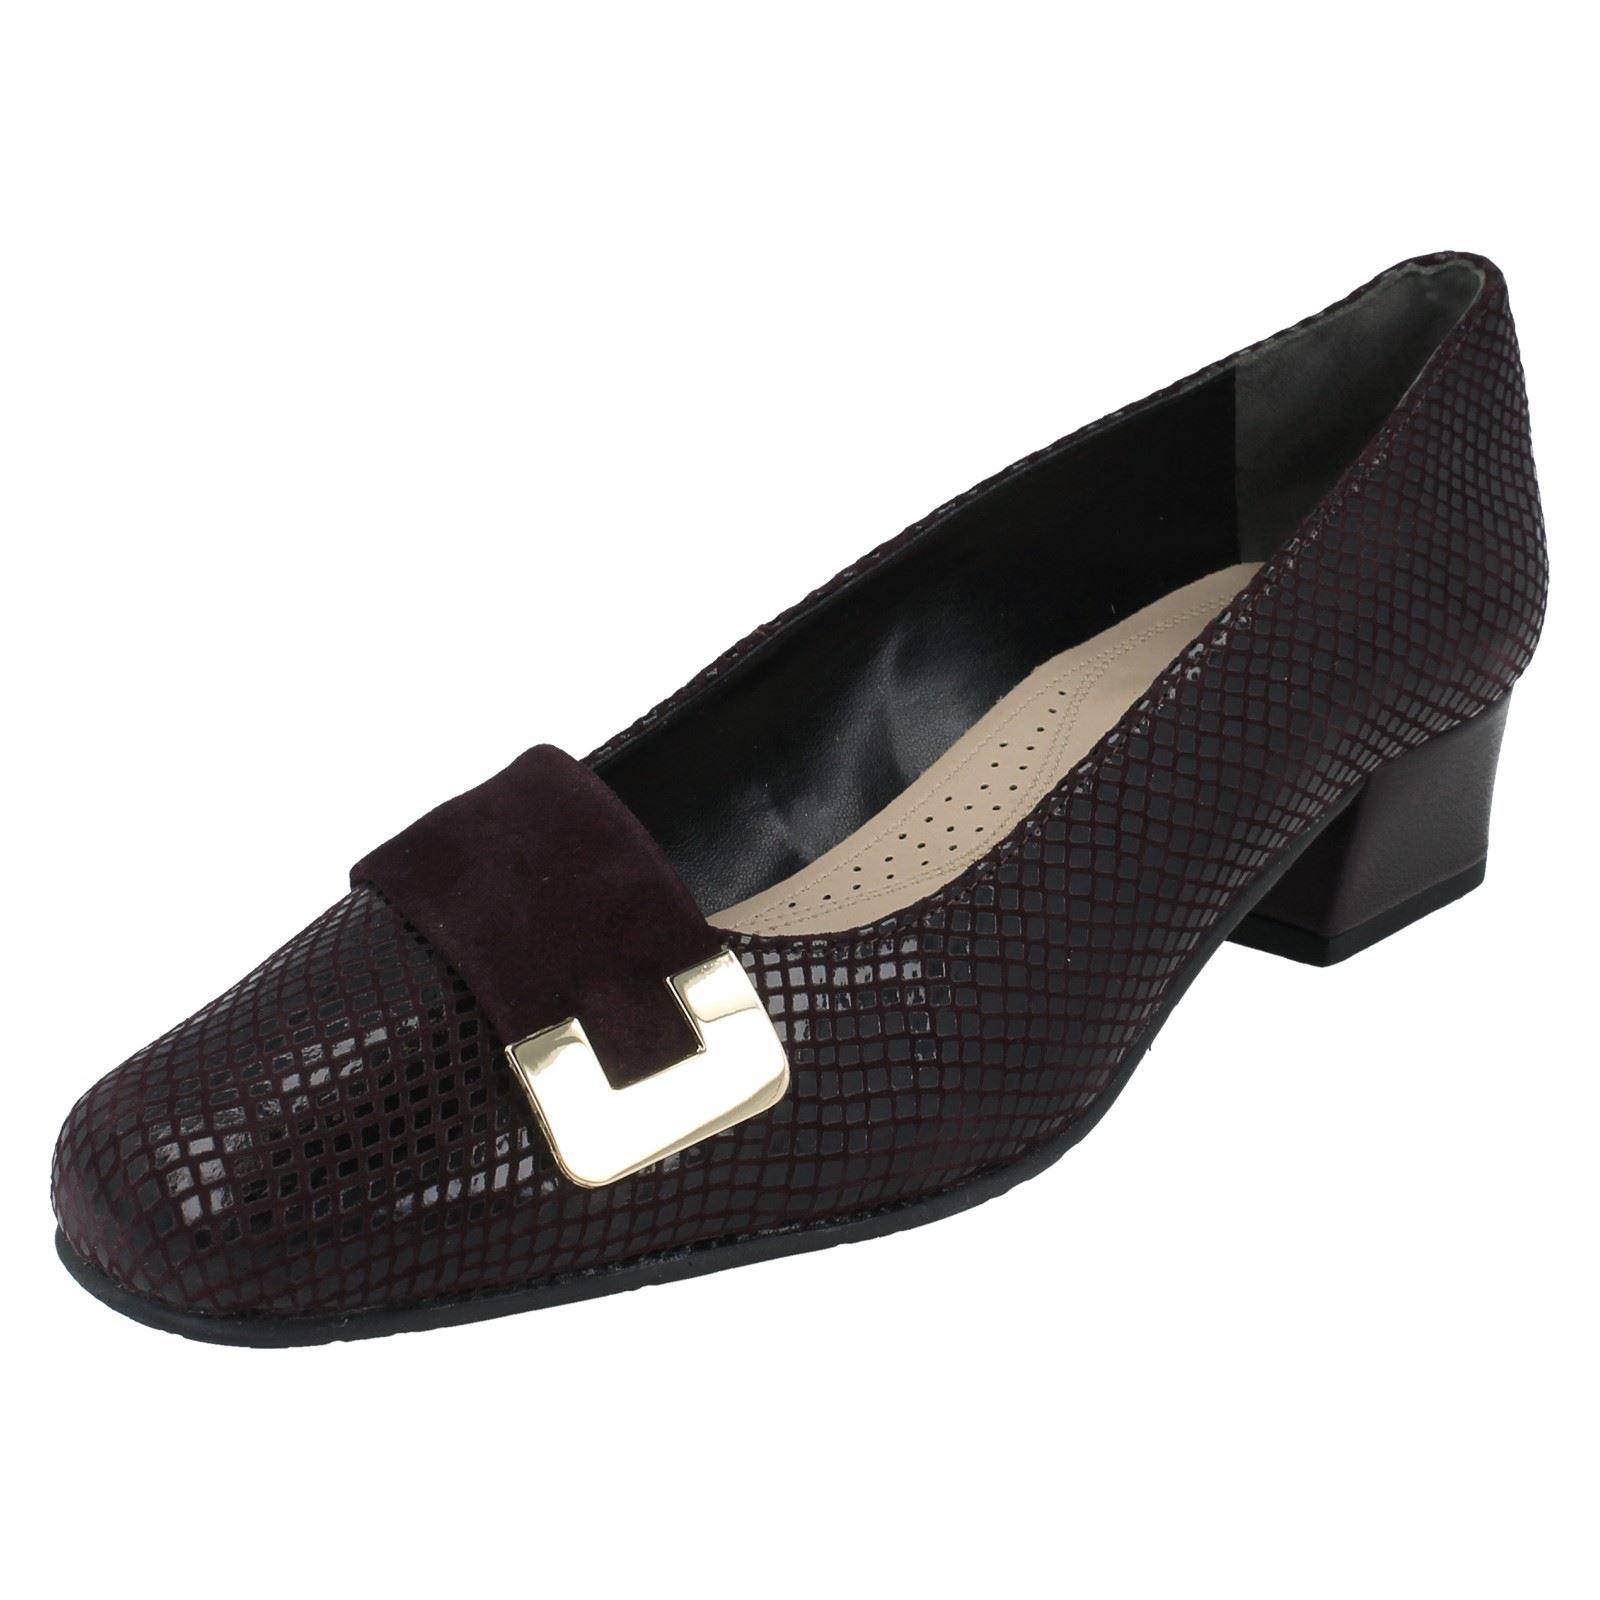 Ladies Van Dal Wide Fit Leather Court Shoes Duchess | eBay